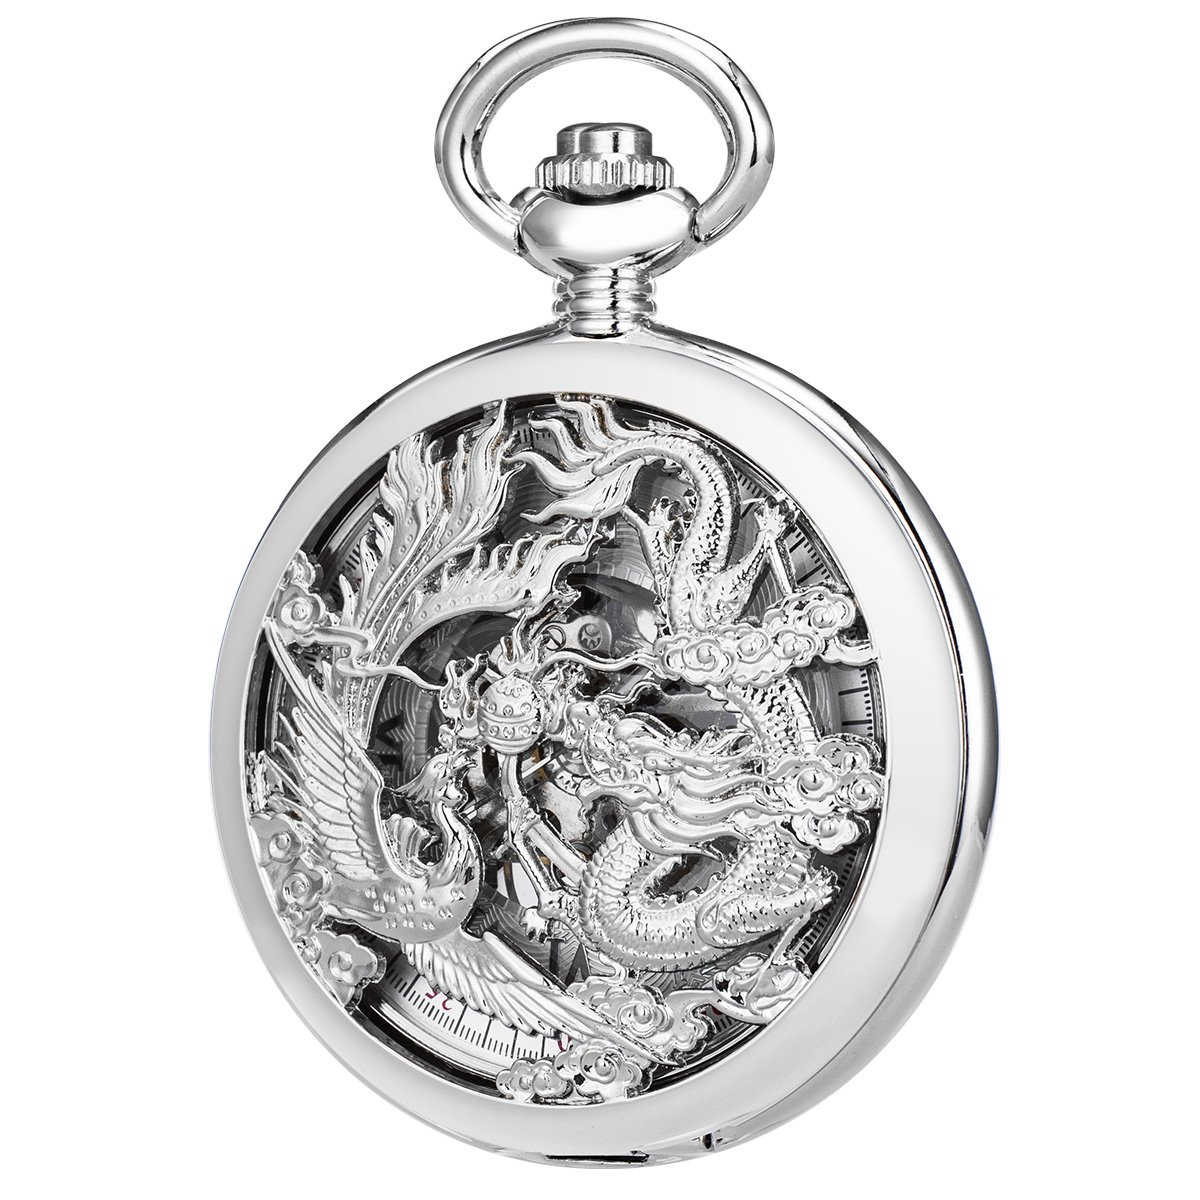 SIBOSUN Antique Phoenix and Dragon Skeleton Pocket Watch Mens Mechanical Silver Half Hunter Hand Wind